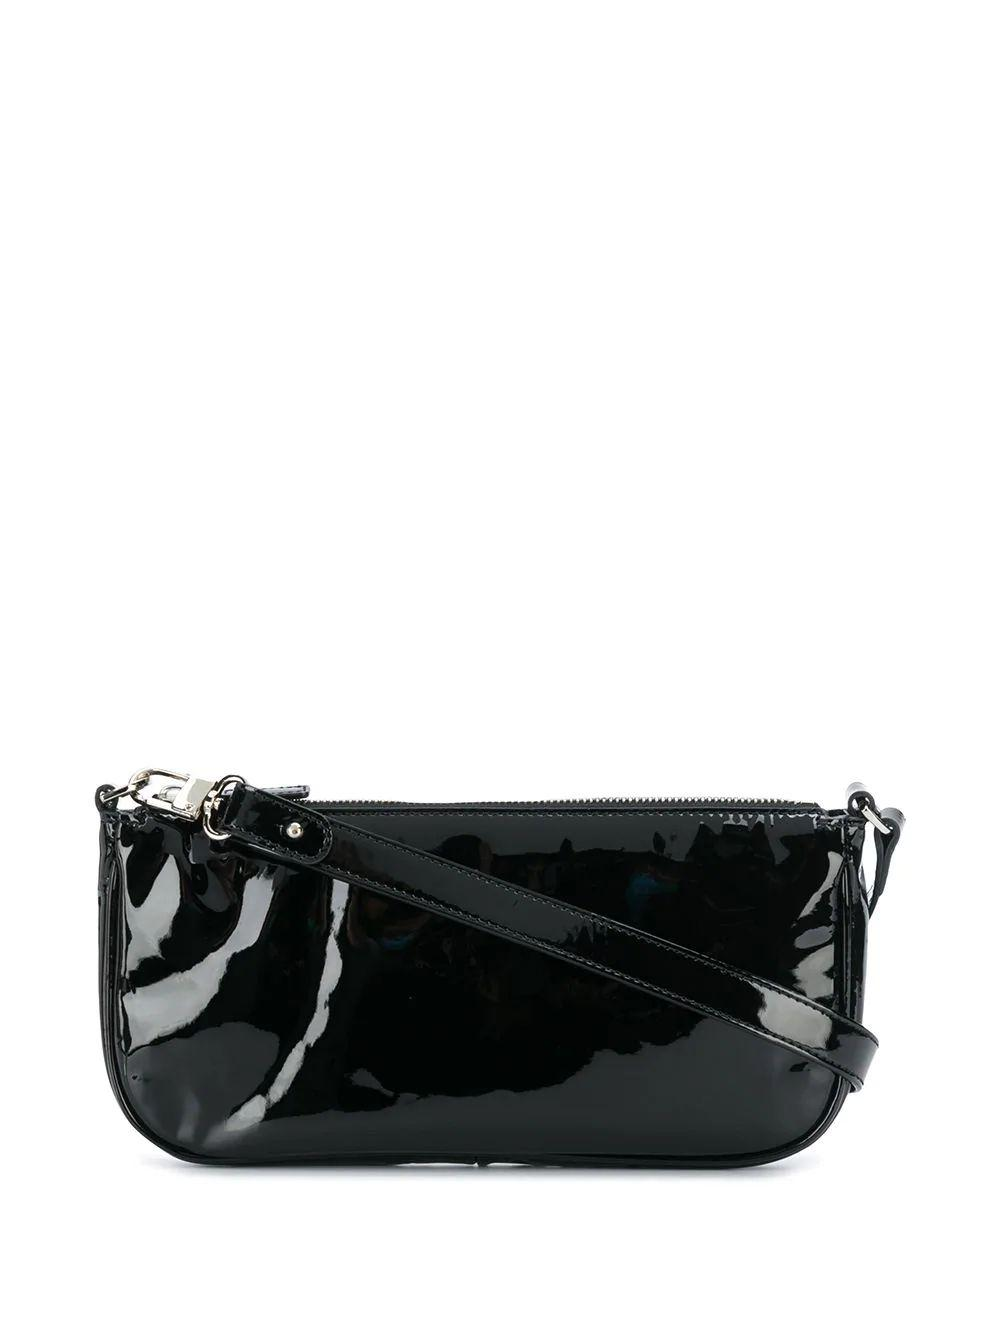 Rachel Patent Leather Shoulder Bag Item # 18FWRCLVBLPMED